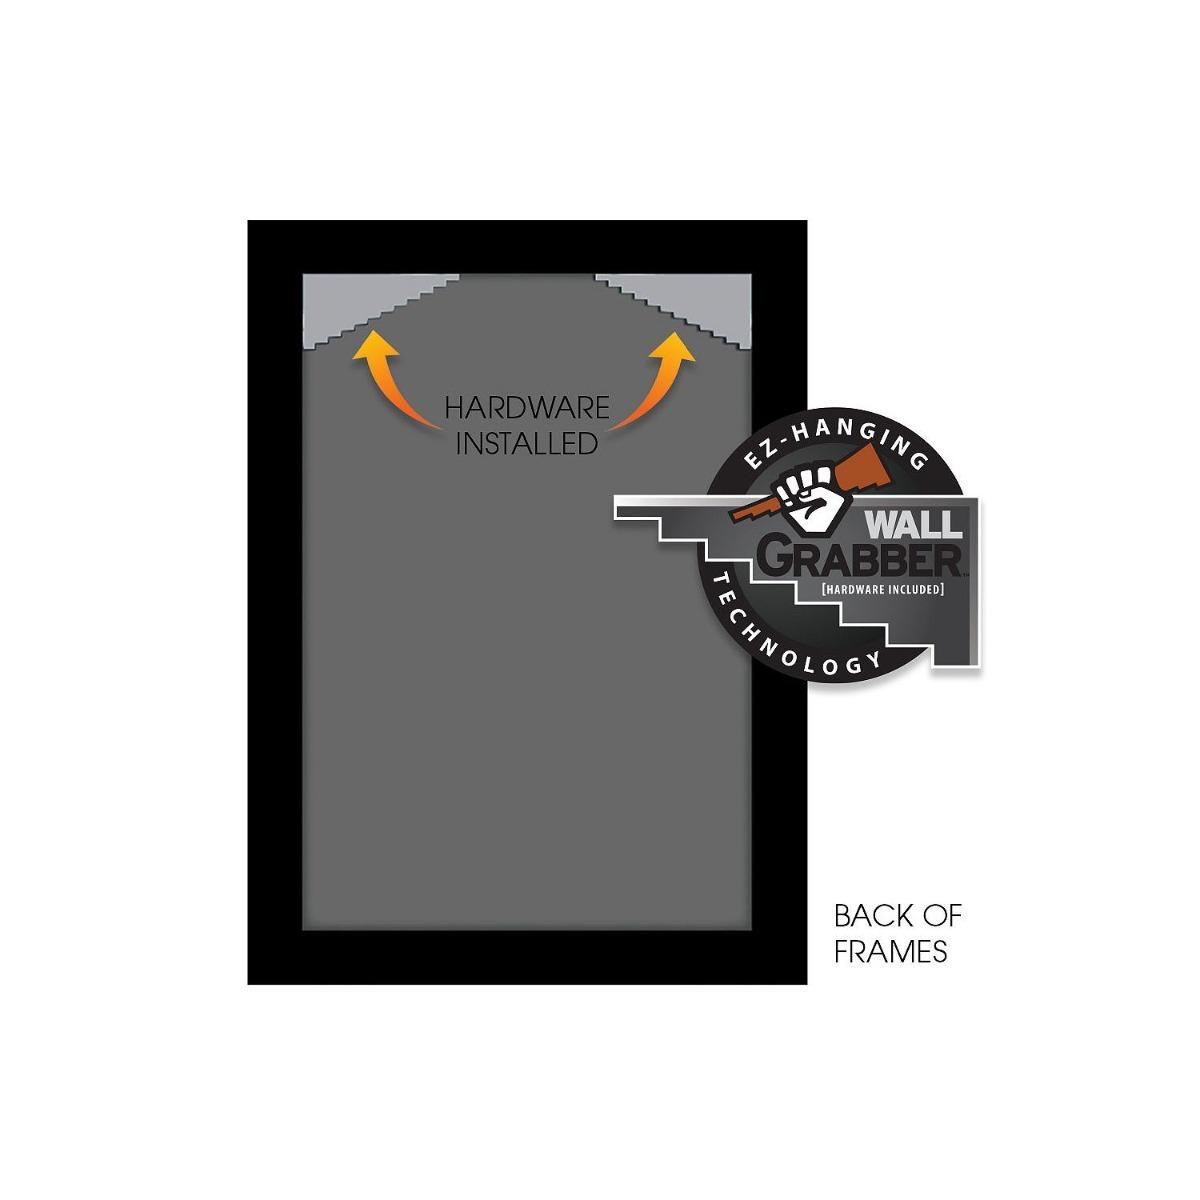 Asombroso Foto Negro Barato Enmarca 8x10 Cresta - Ideas ...